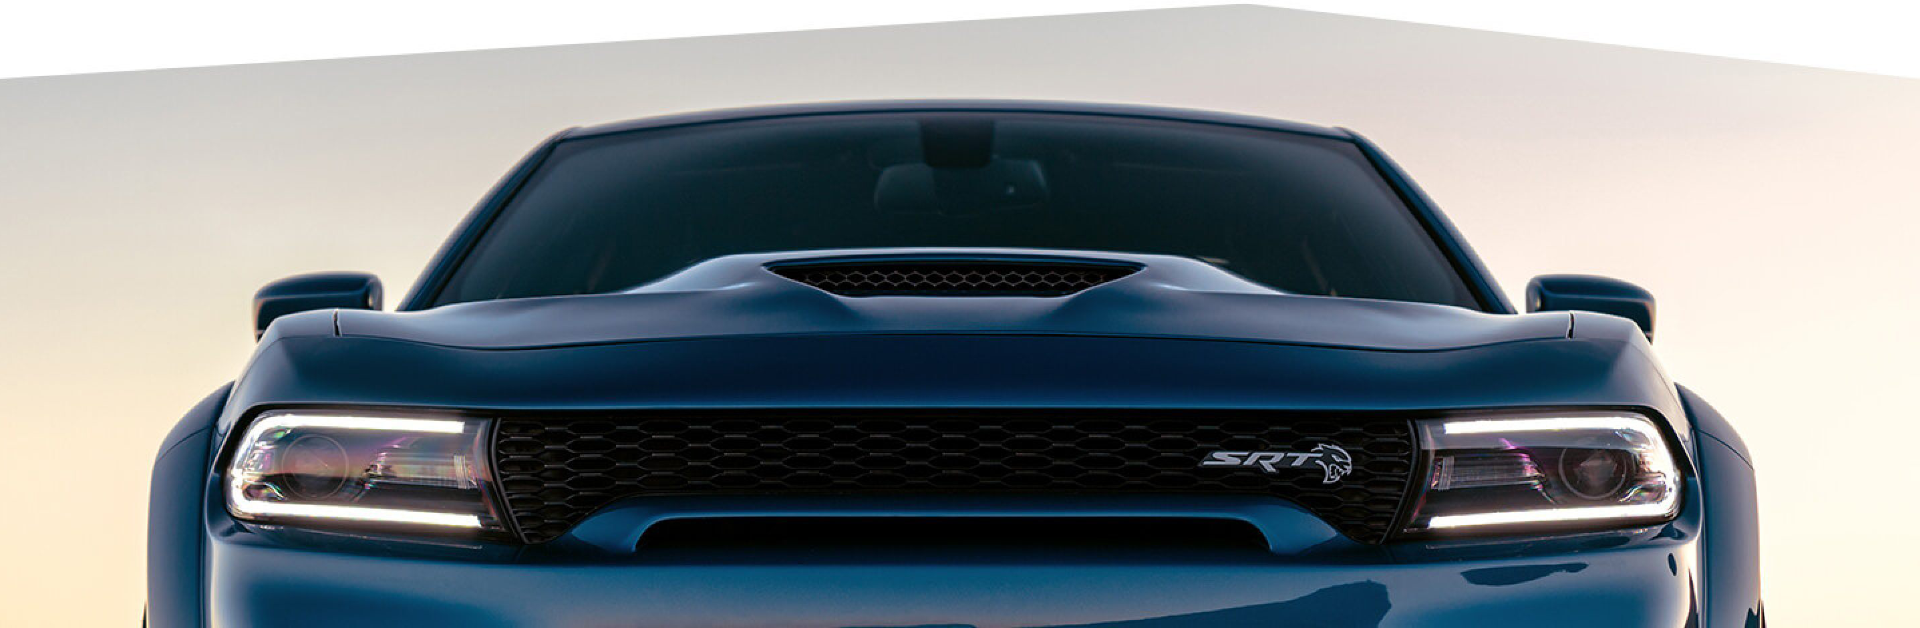 sleek and sharp